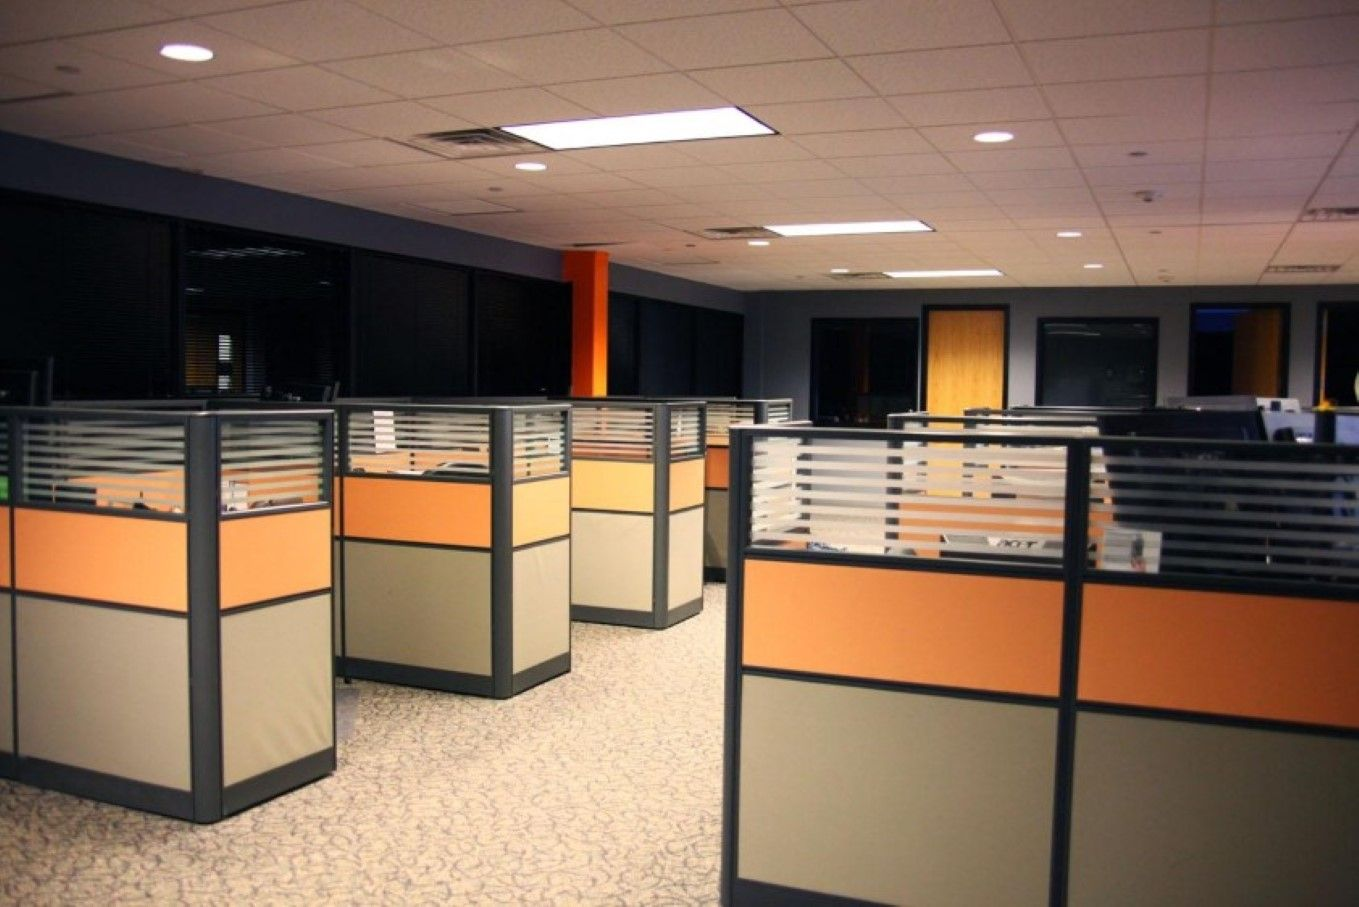 Cubicles Orange Cubicle Design Cubicle Walls Office Floor Plan